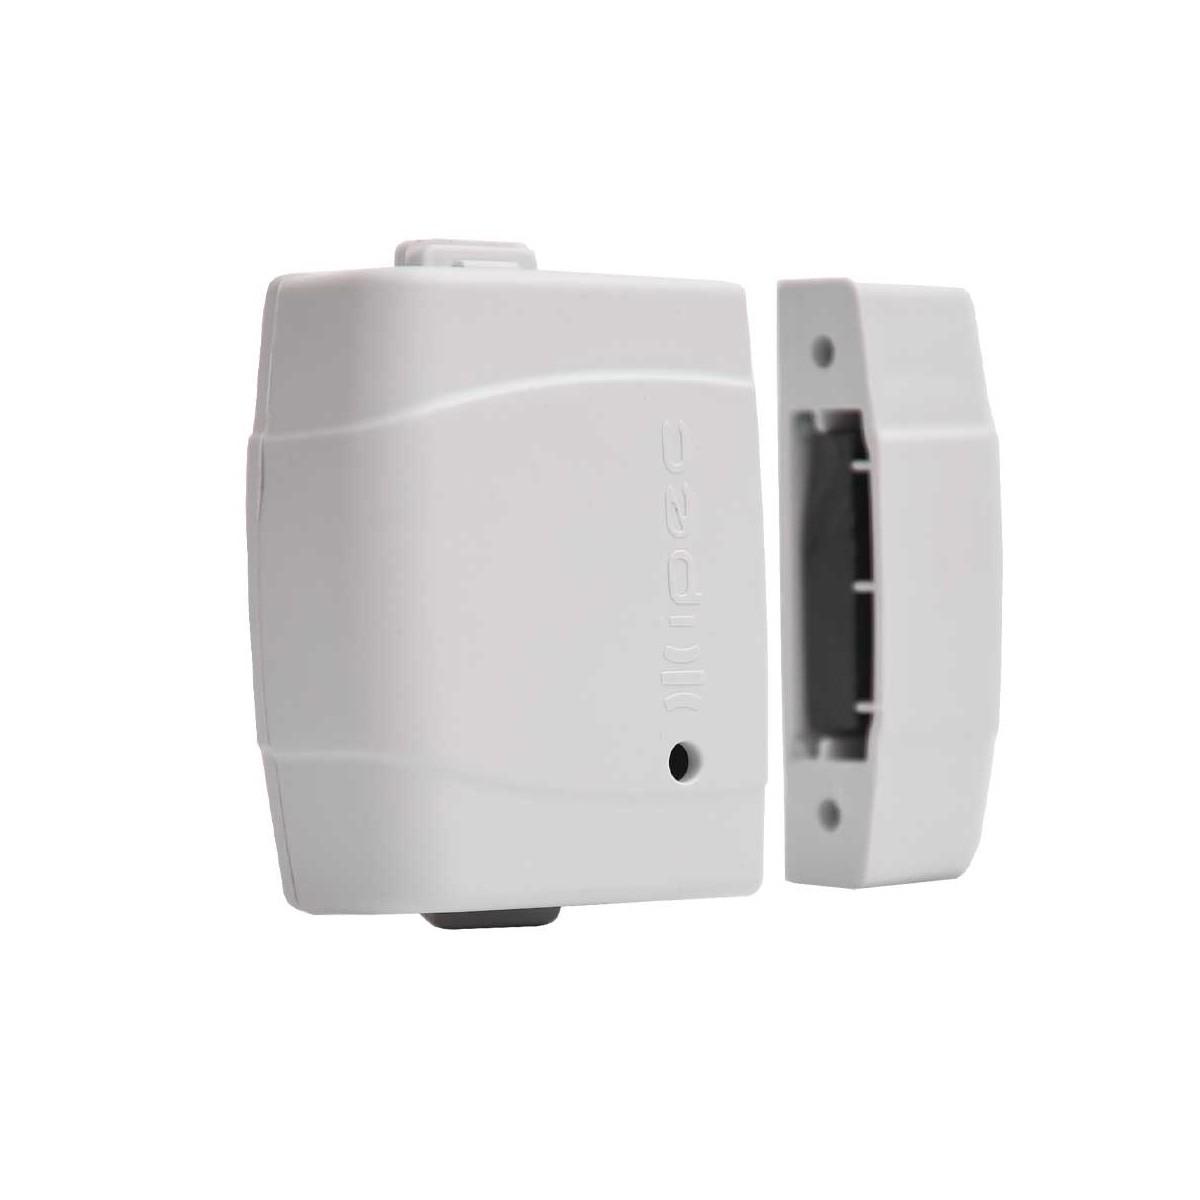 10pcs Sensor Magnético Sem Fio Alarme Residencial Portas Janelas Saw 433,92mhz Ipec